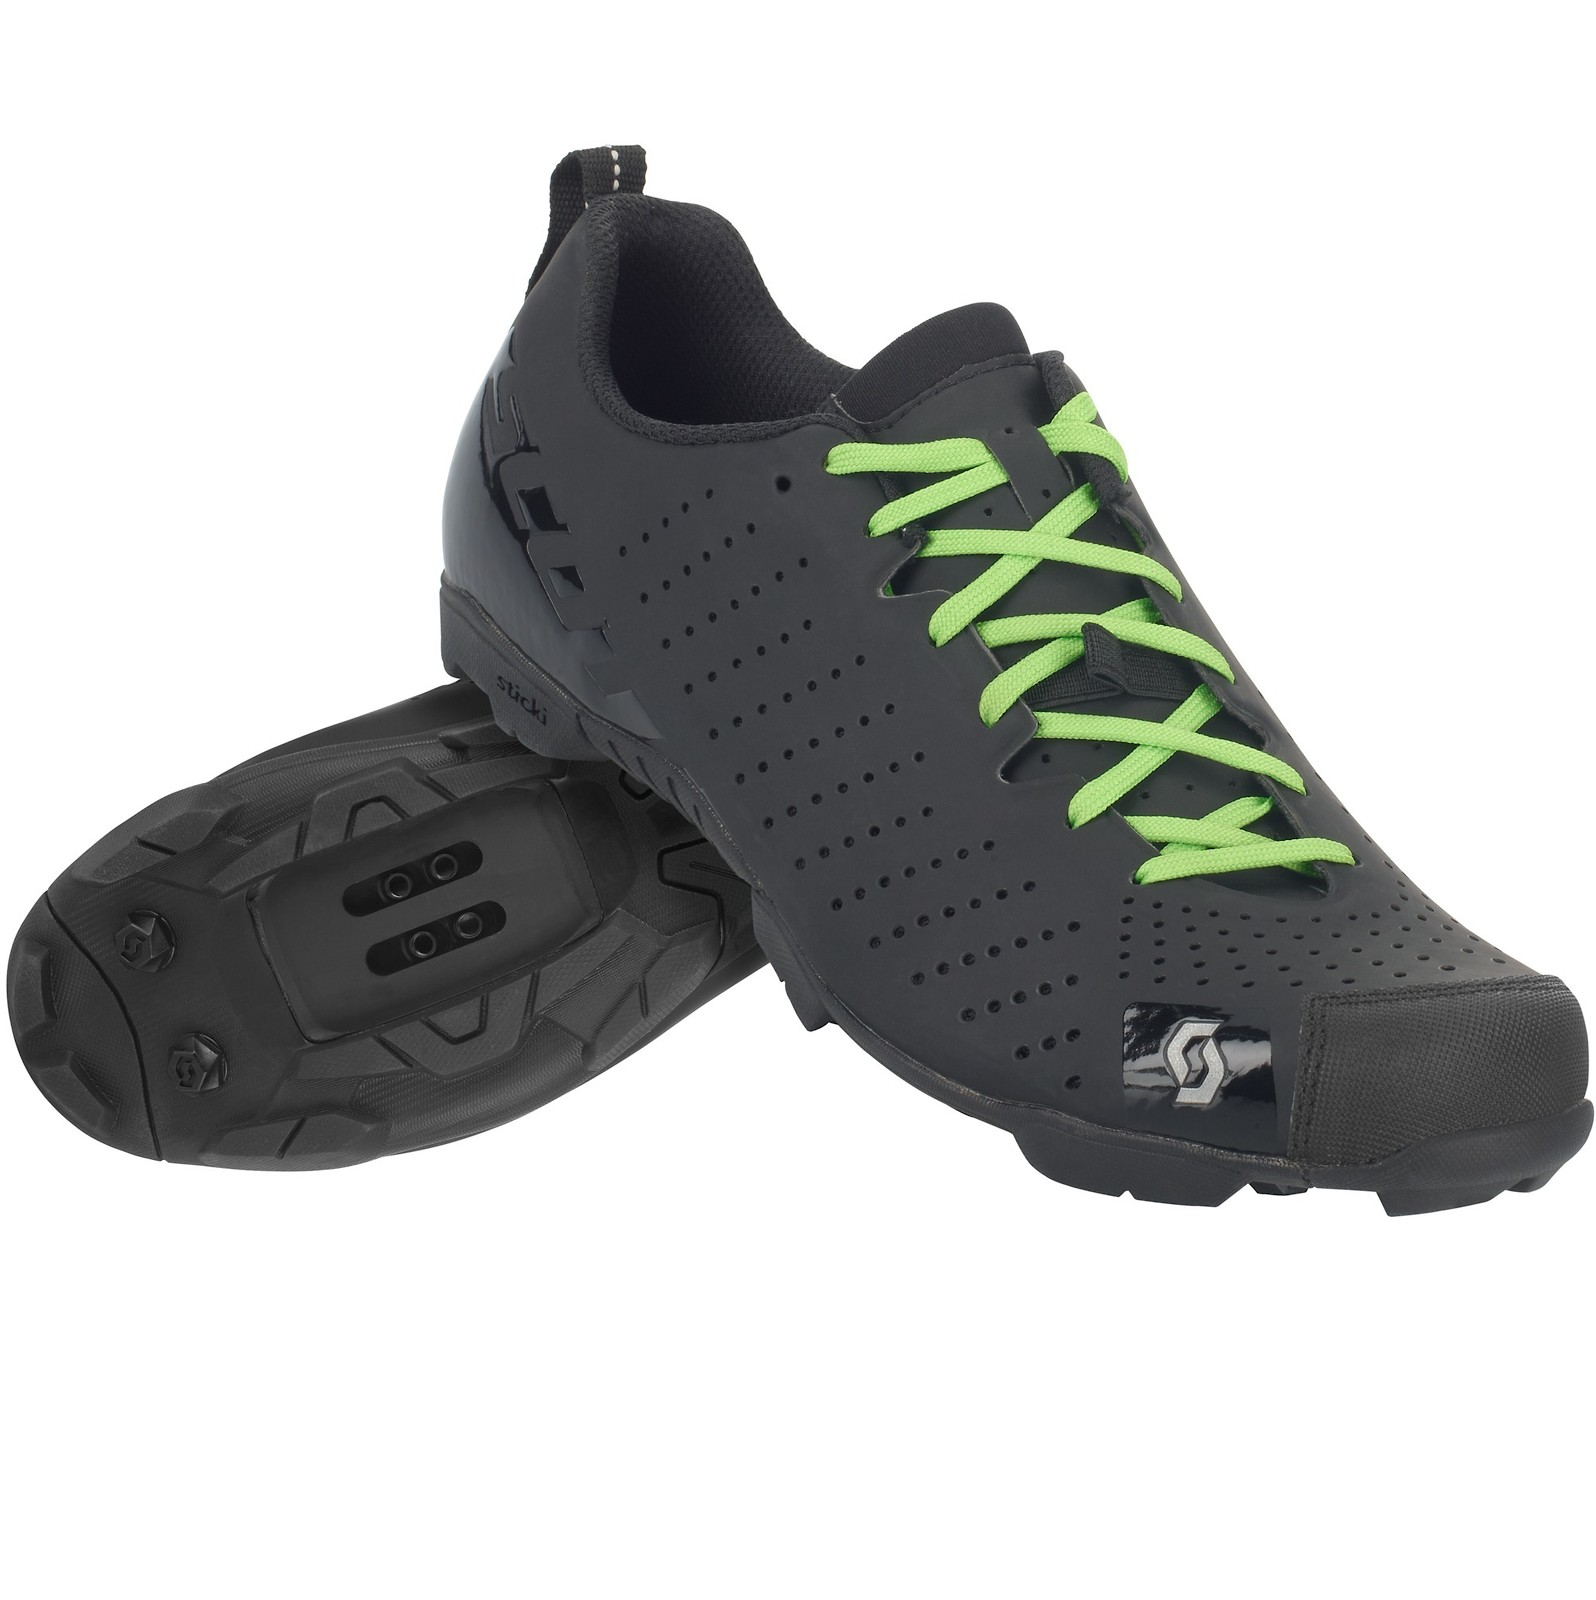 Scott Comp Lace shoe in gloss black/matte black